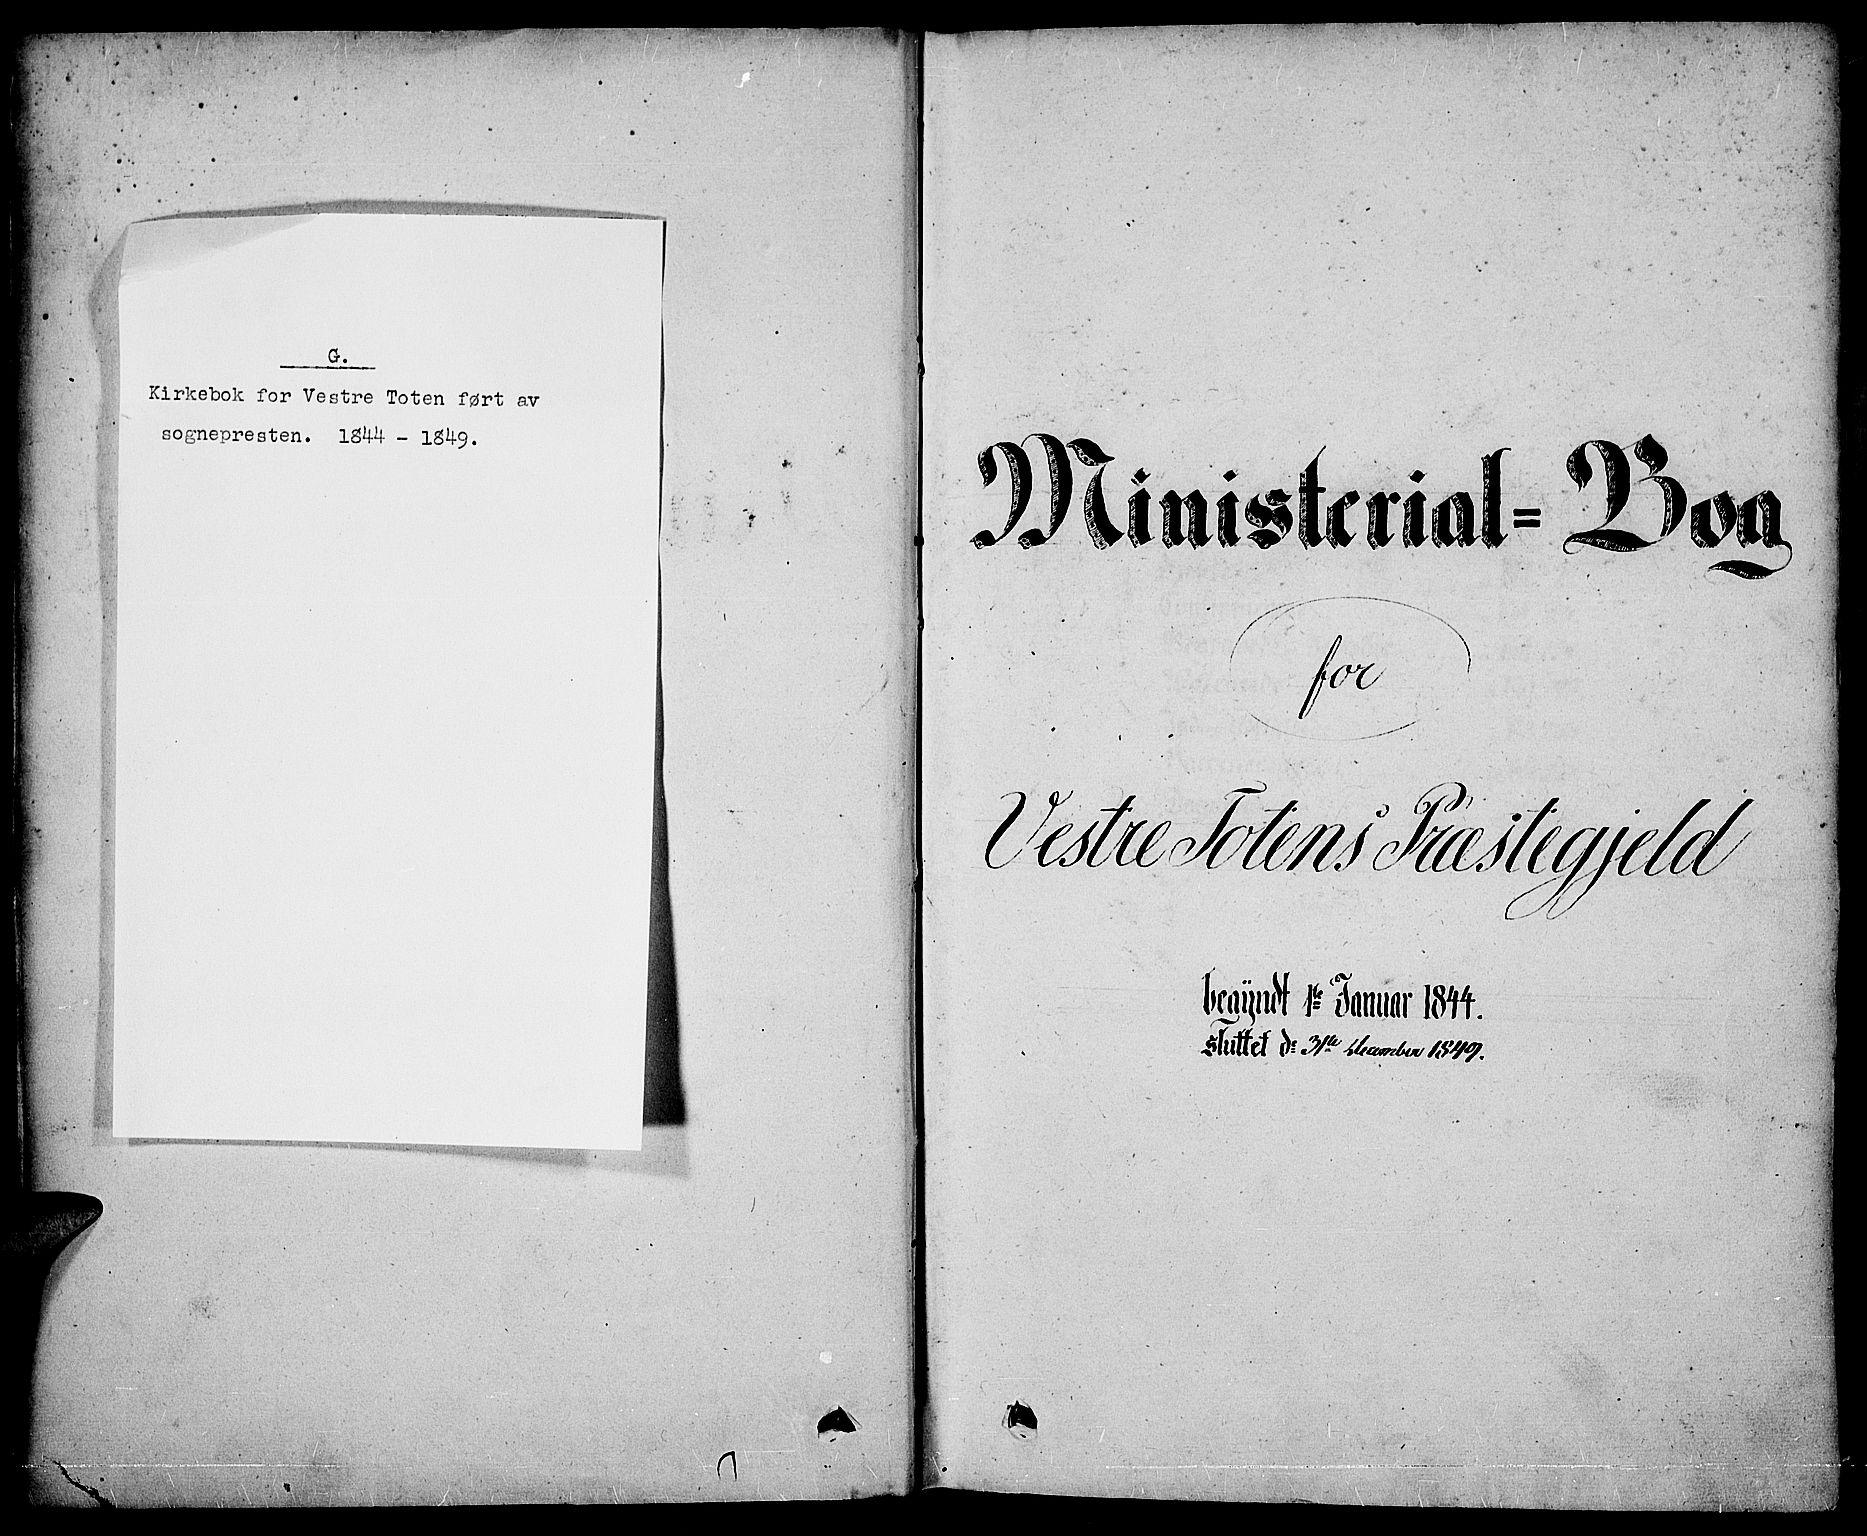 SAH, Vestre Toten prestekontor, Ministerialbok nr. 4, 1844-1849